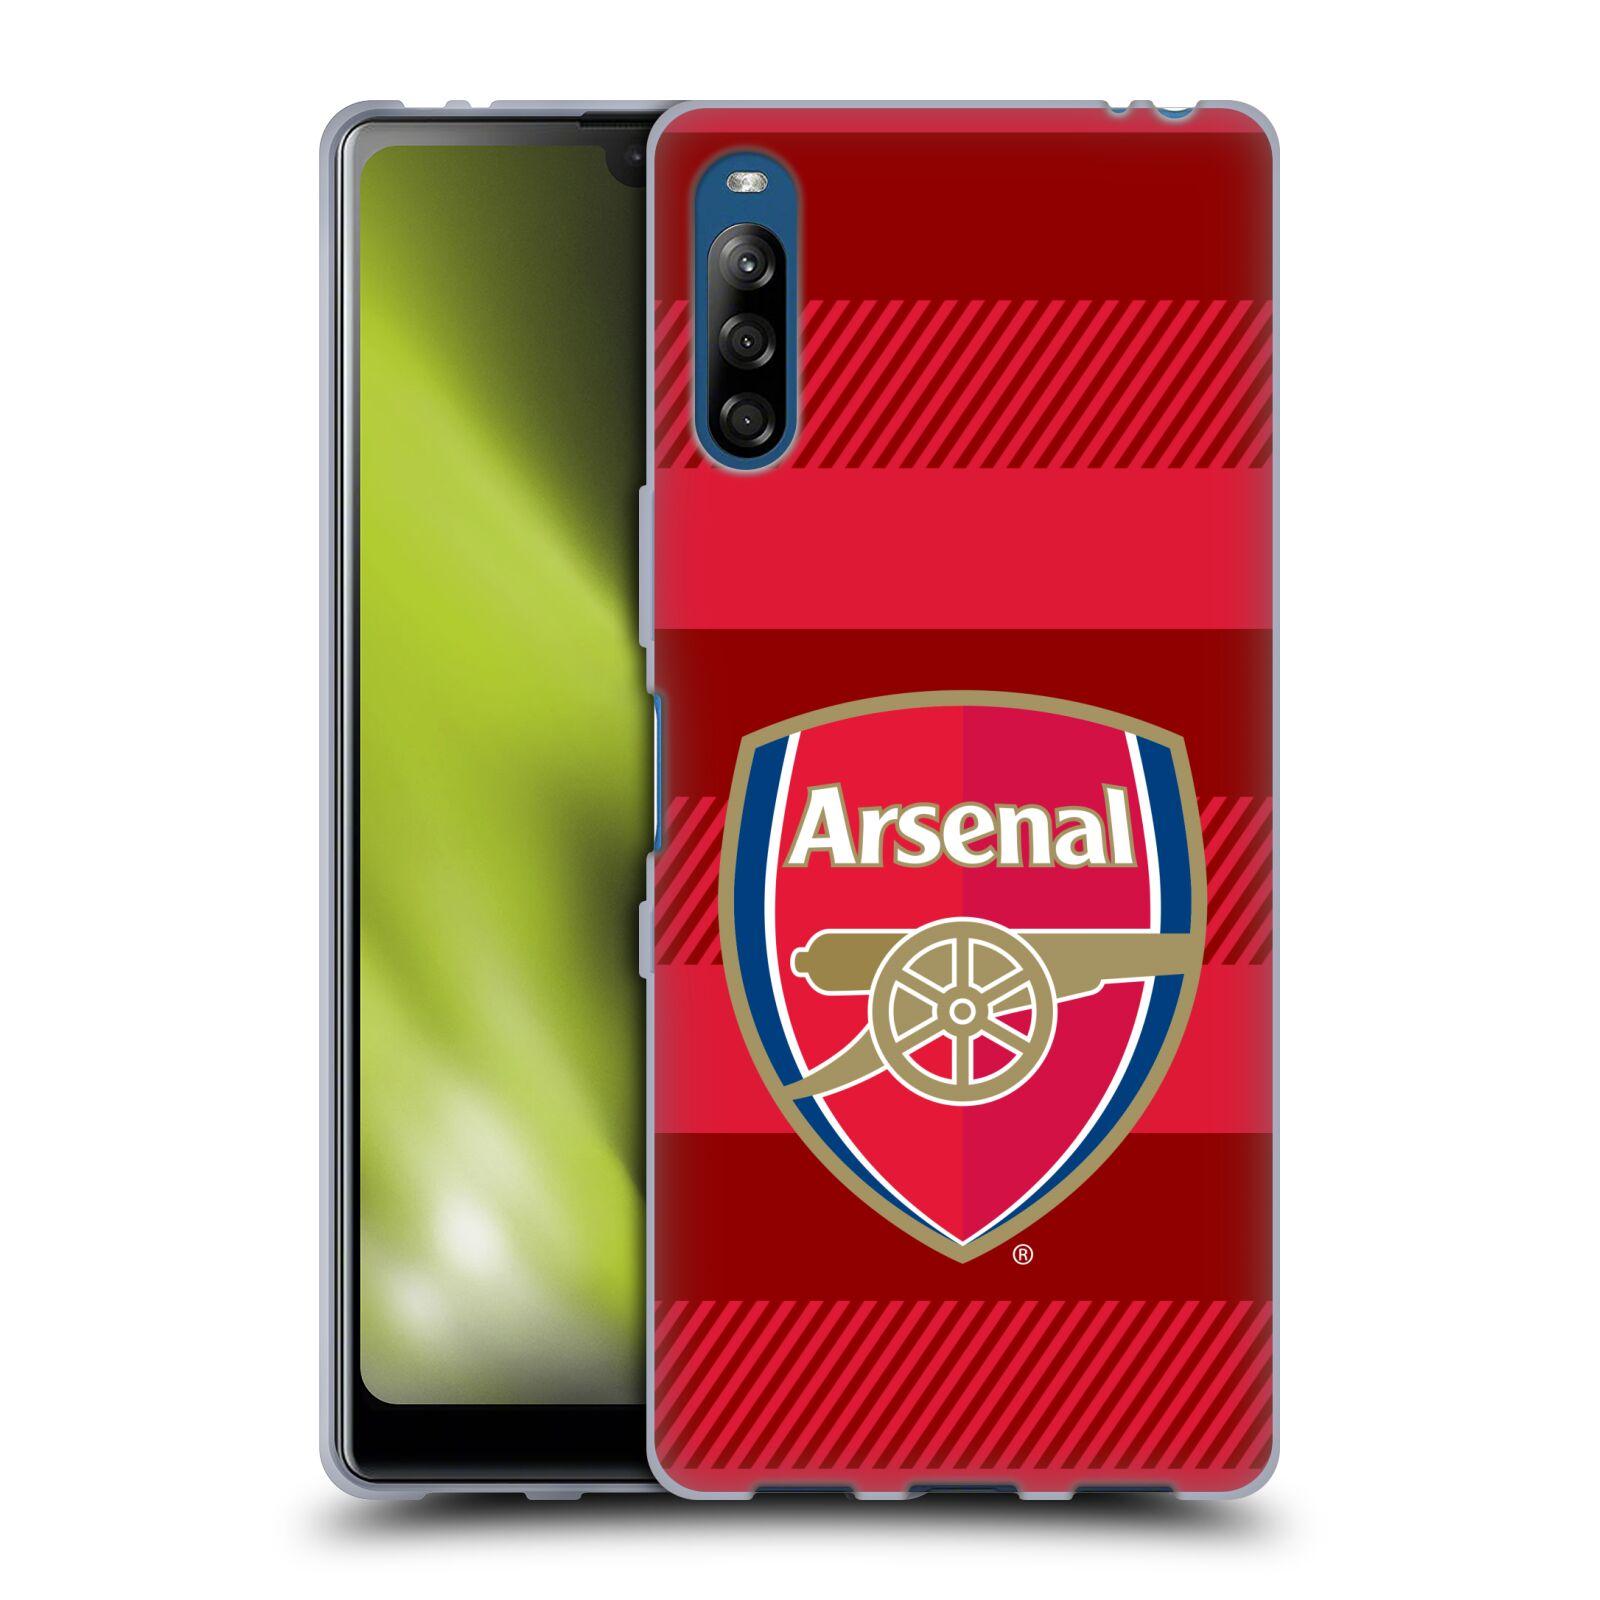 Silikonové pouzdro na mobil Sony Xperia L4 - Head Case - Arsenal FC - Logo s pruhy